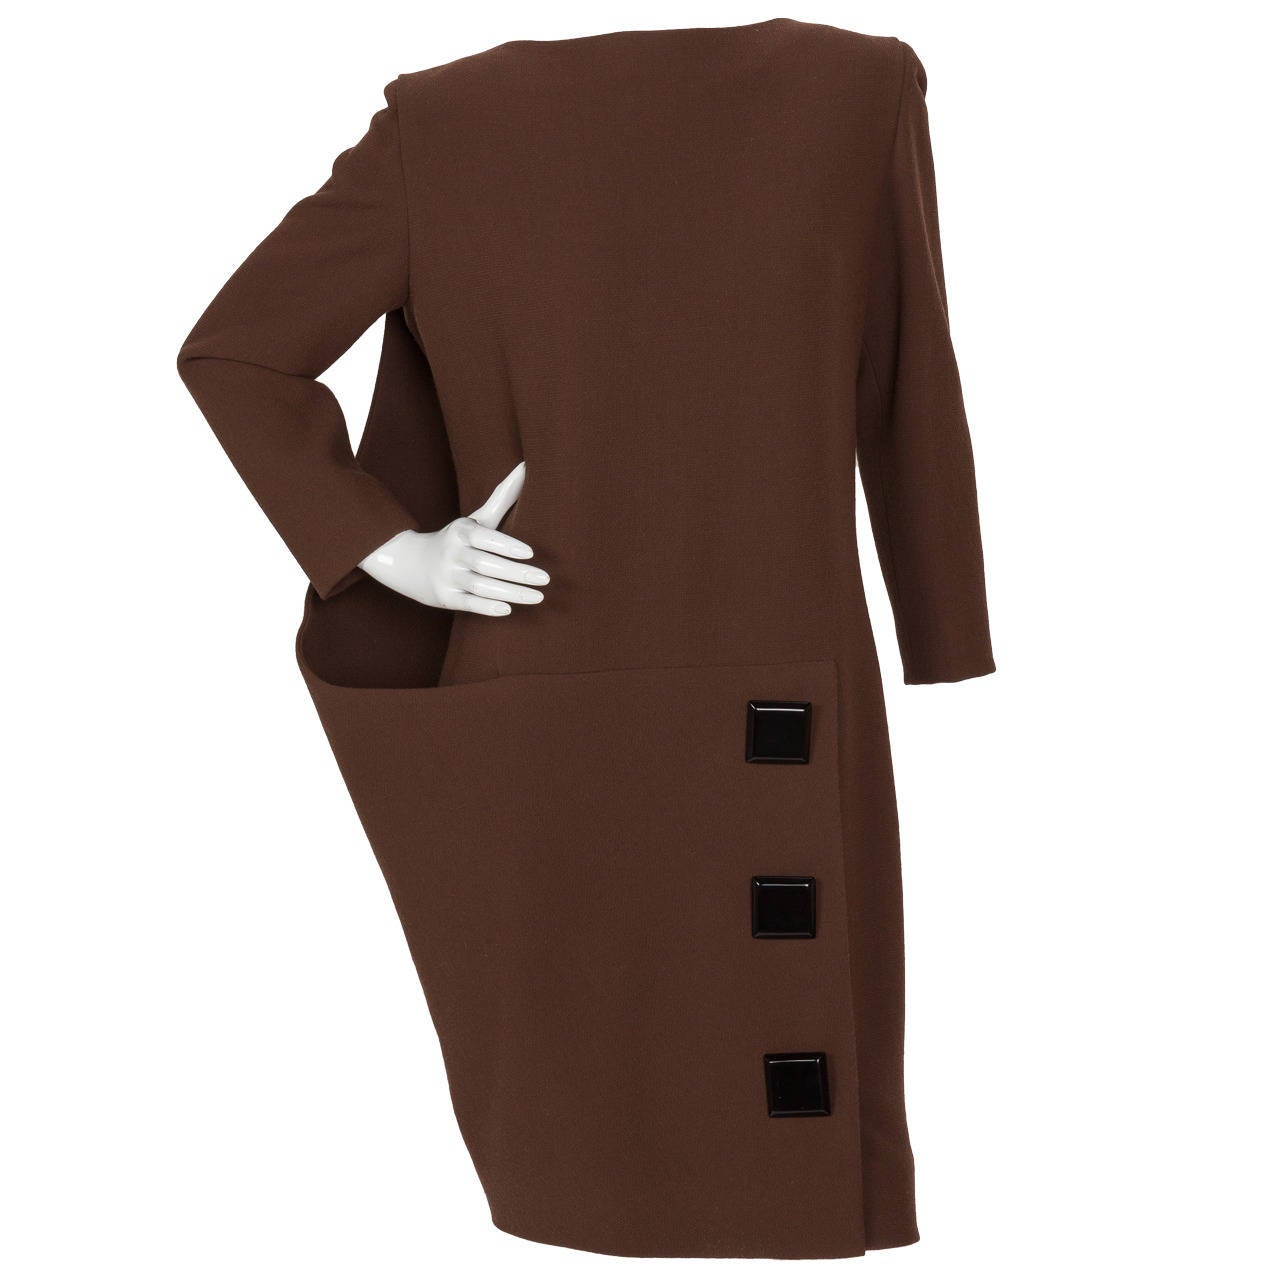 Avant Garde Pierre Cardin Haute Couture Asymmetric Wool Cocktail Dress ca. 1992